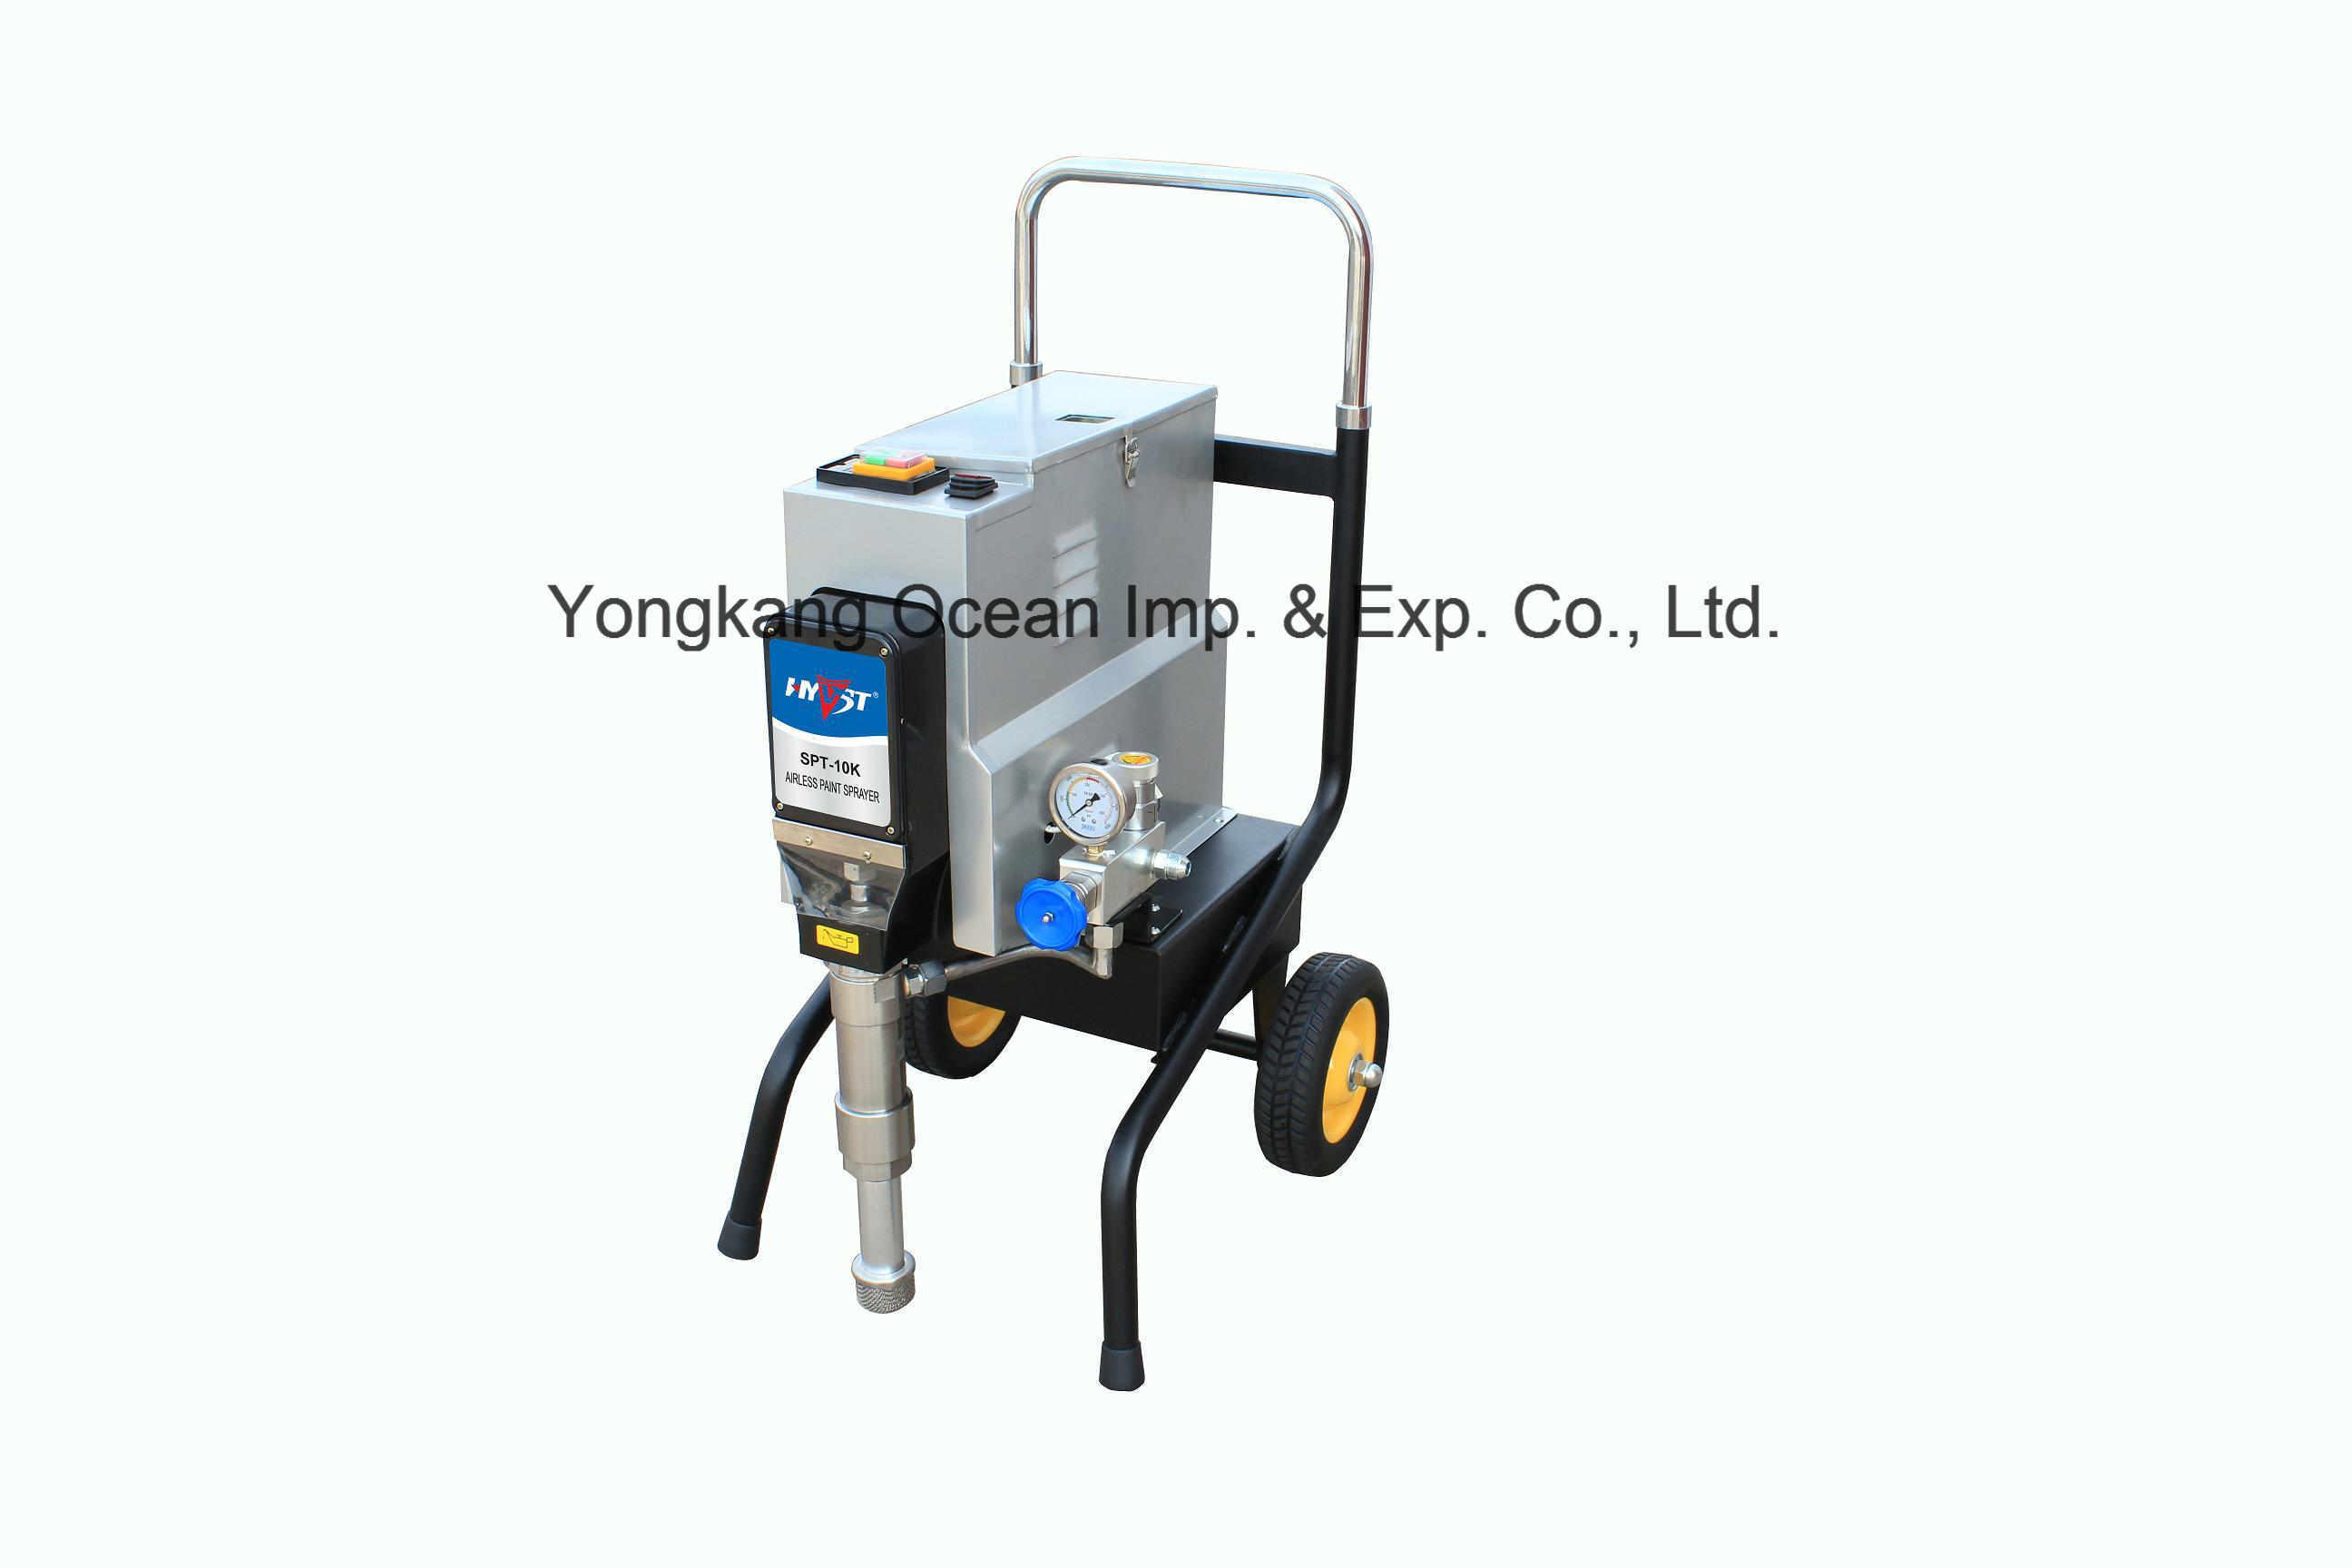 Hyvst Electric High Pressure Airless Paint Sprayer Spt-10k